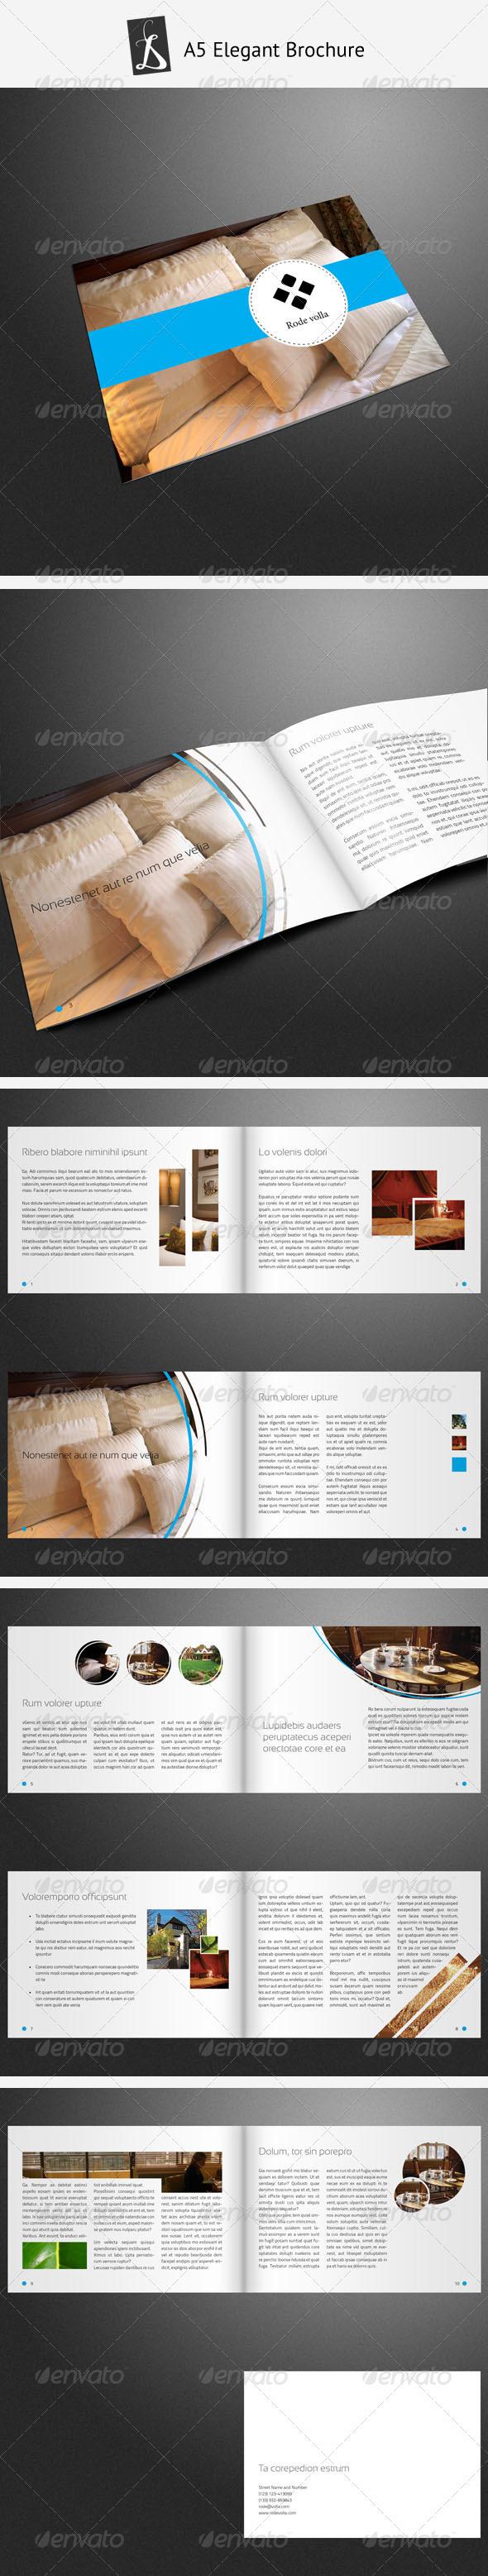 A5 Brochure 9 - Corporate Brochures